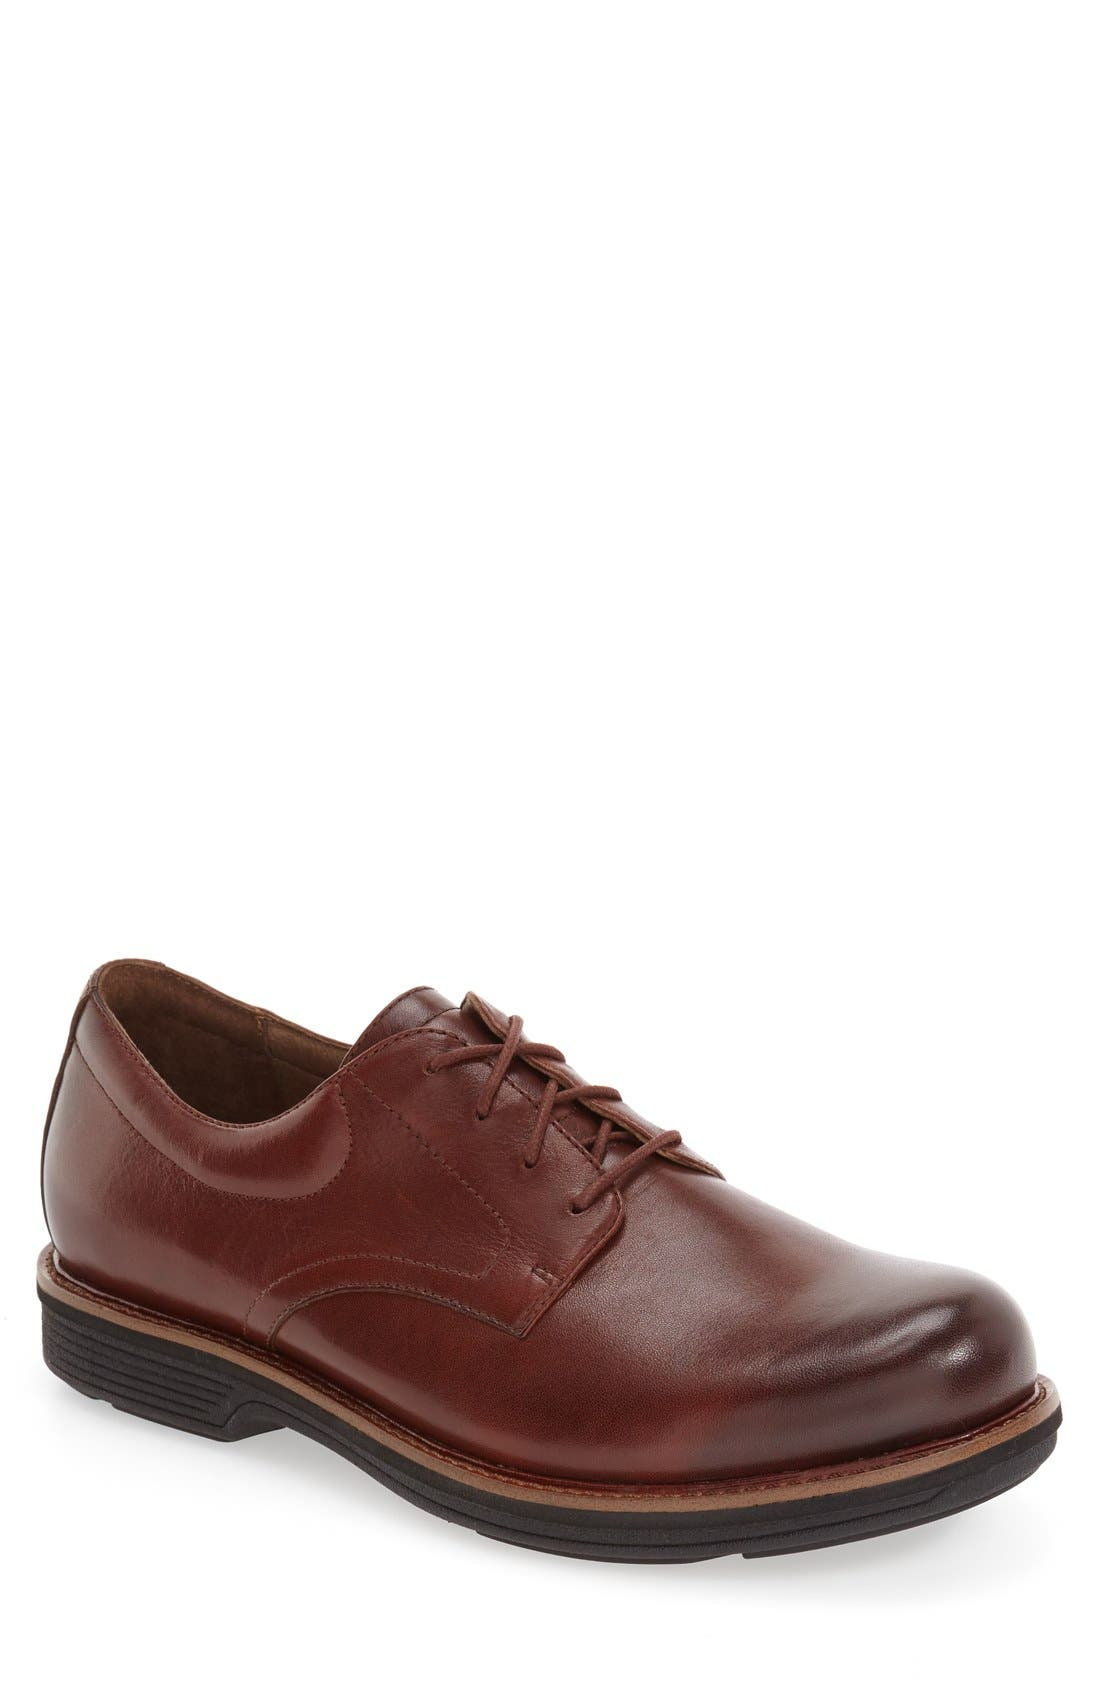 'Josh' Plain Toe Derby,                         Main,                         color, Mahogany Antiqued Calf Leather